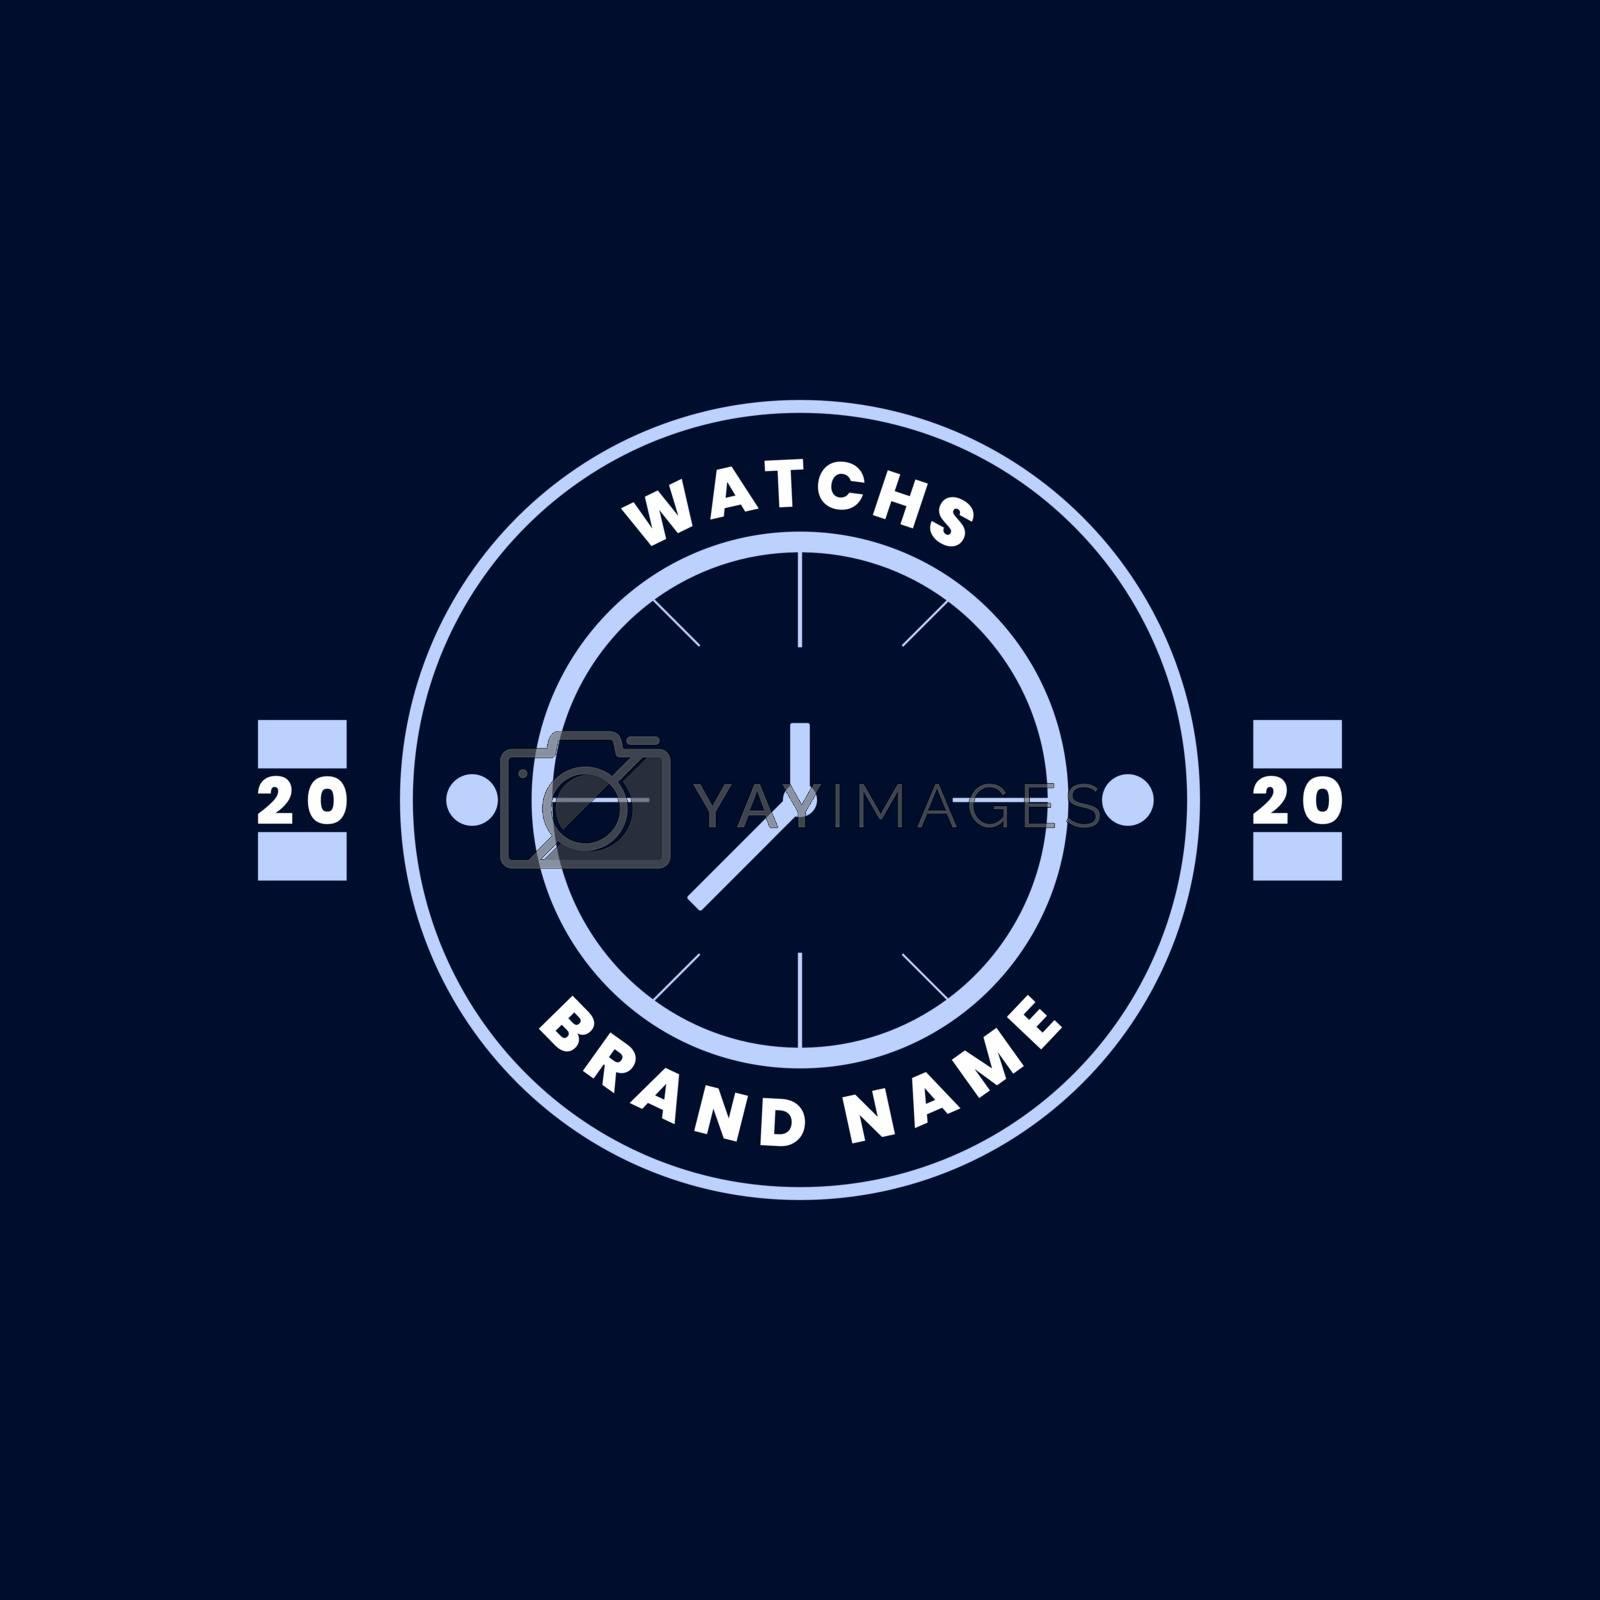 flat badge logo design. watch brand logo. modern and vintage styles by arsyadee